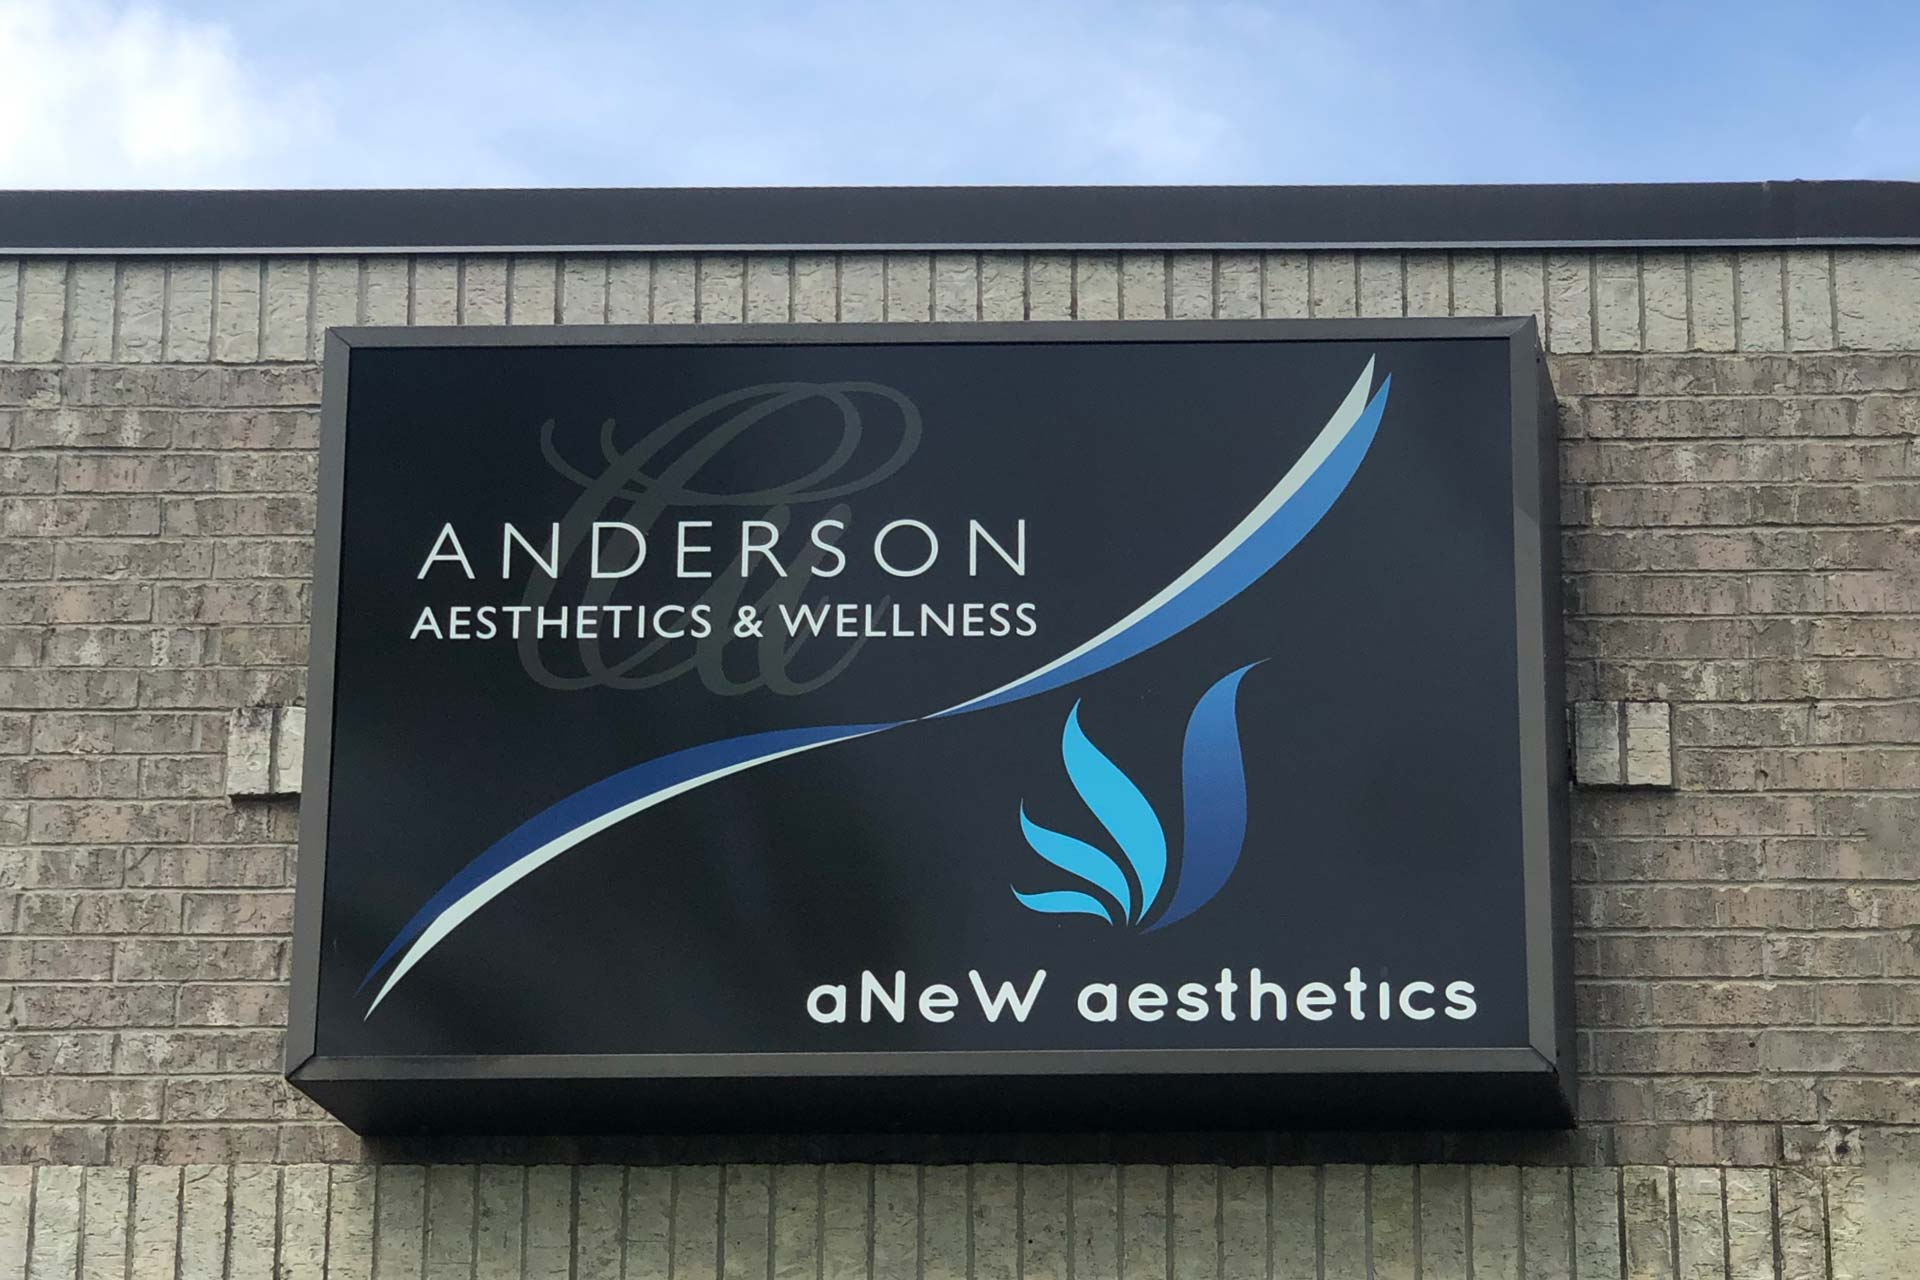 Anderson_Aesthetics_Wellness_exterior_location_sign